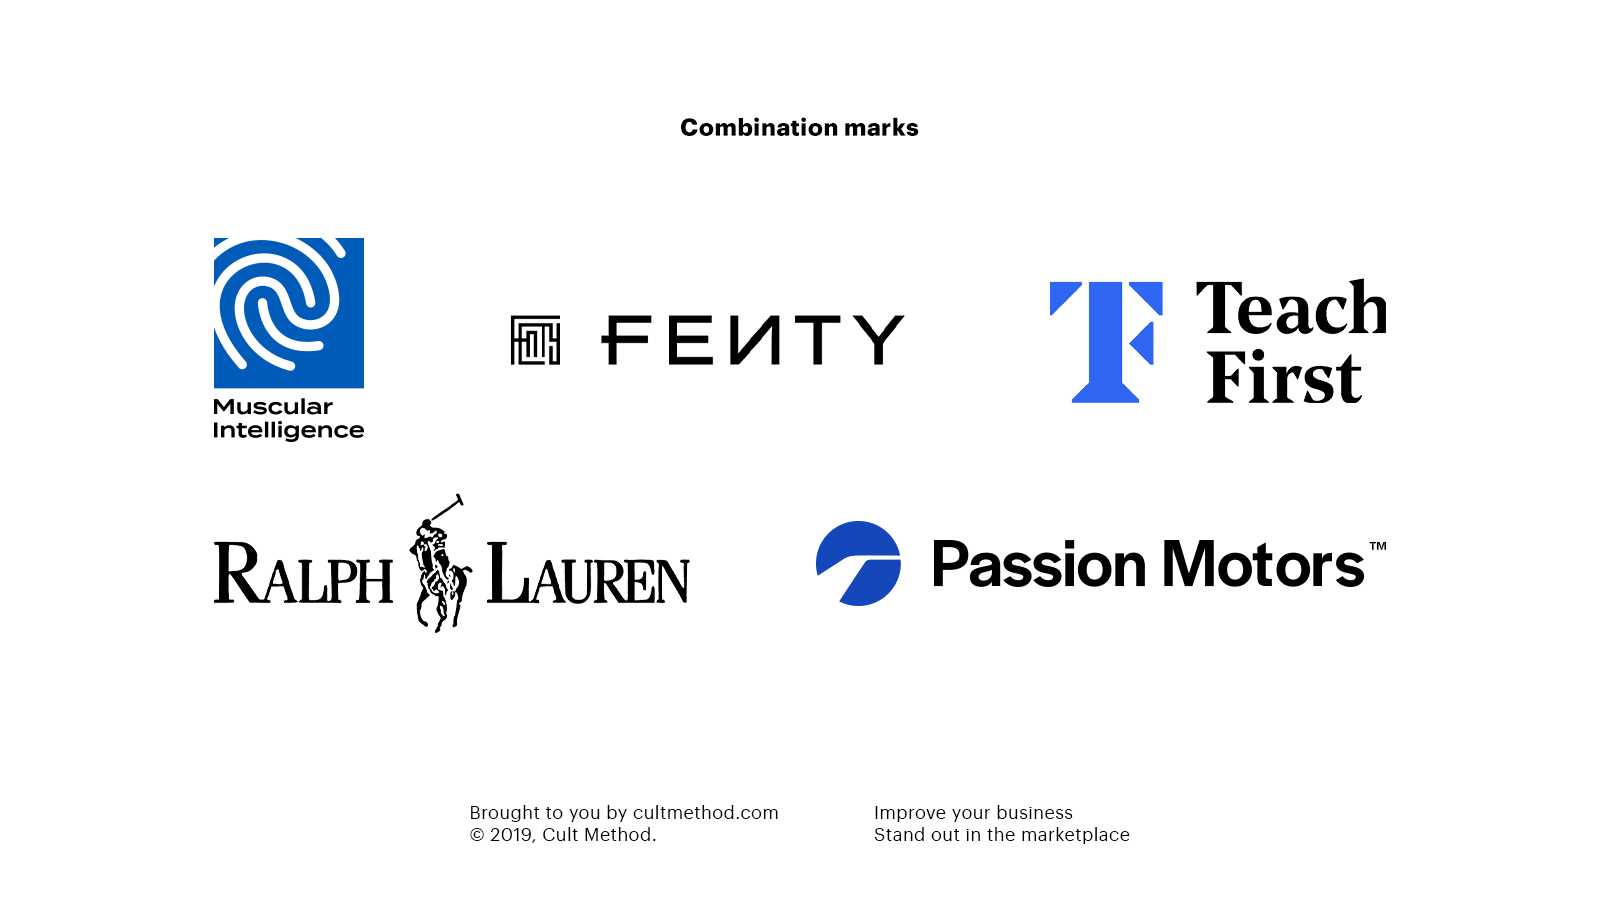 Combination marks